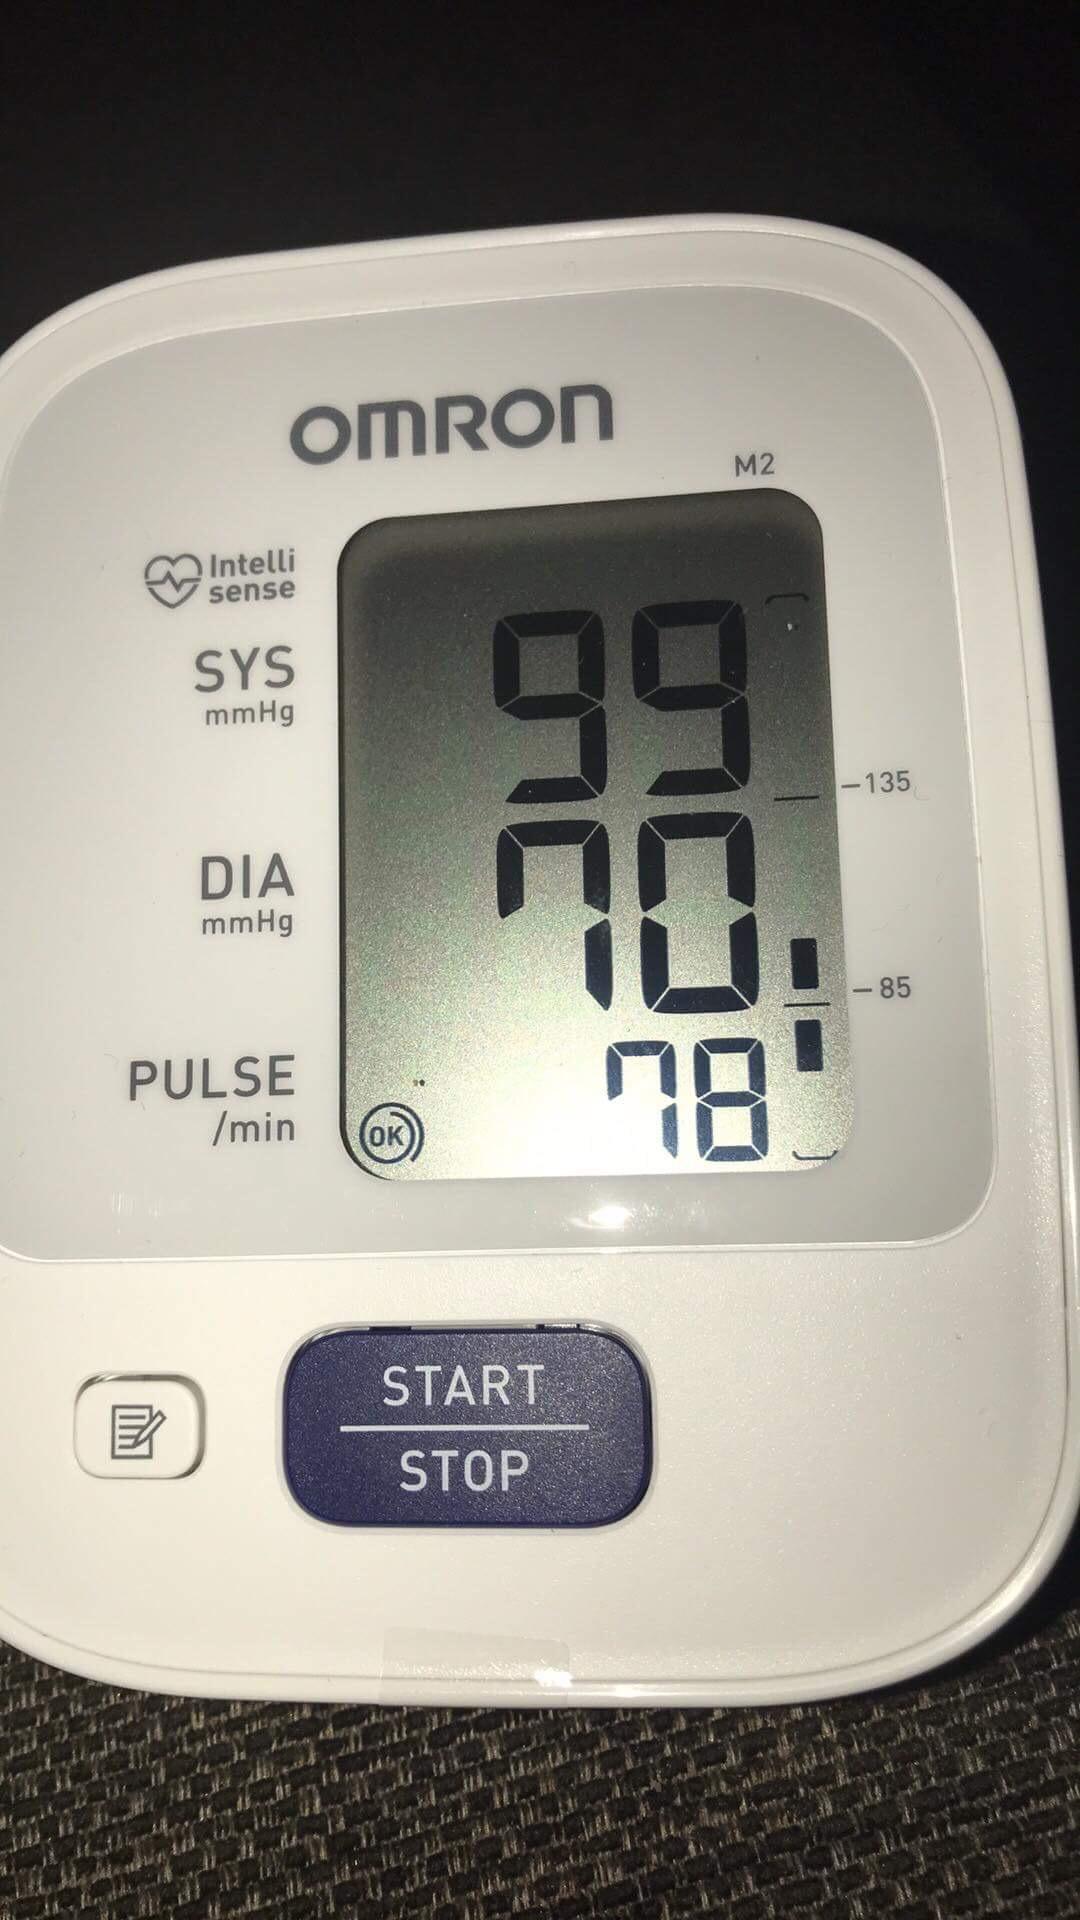 Lågt blodtryck gravid normalt blodtryck